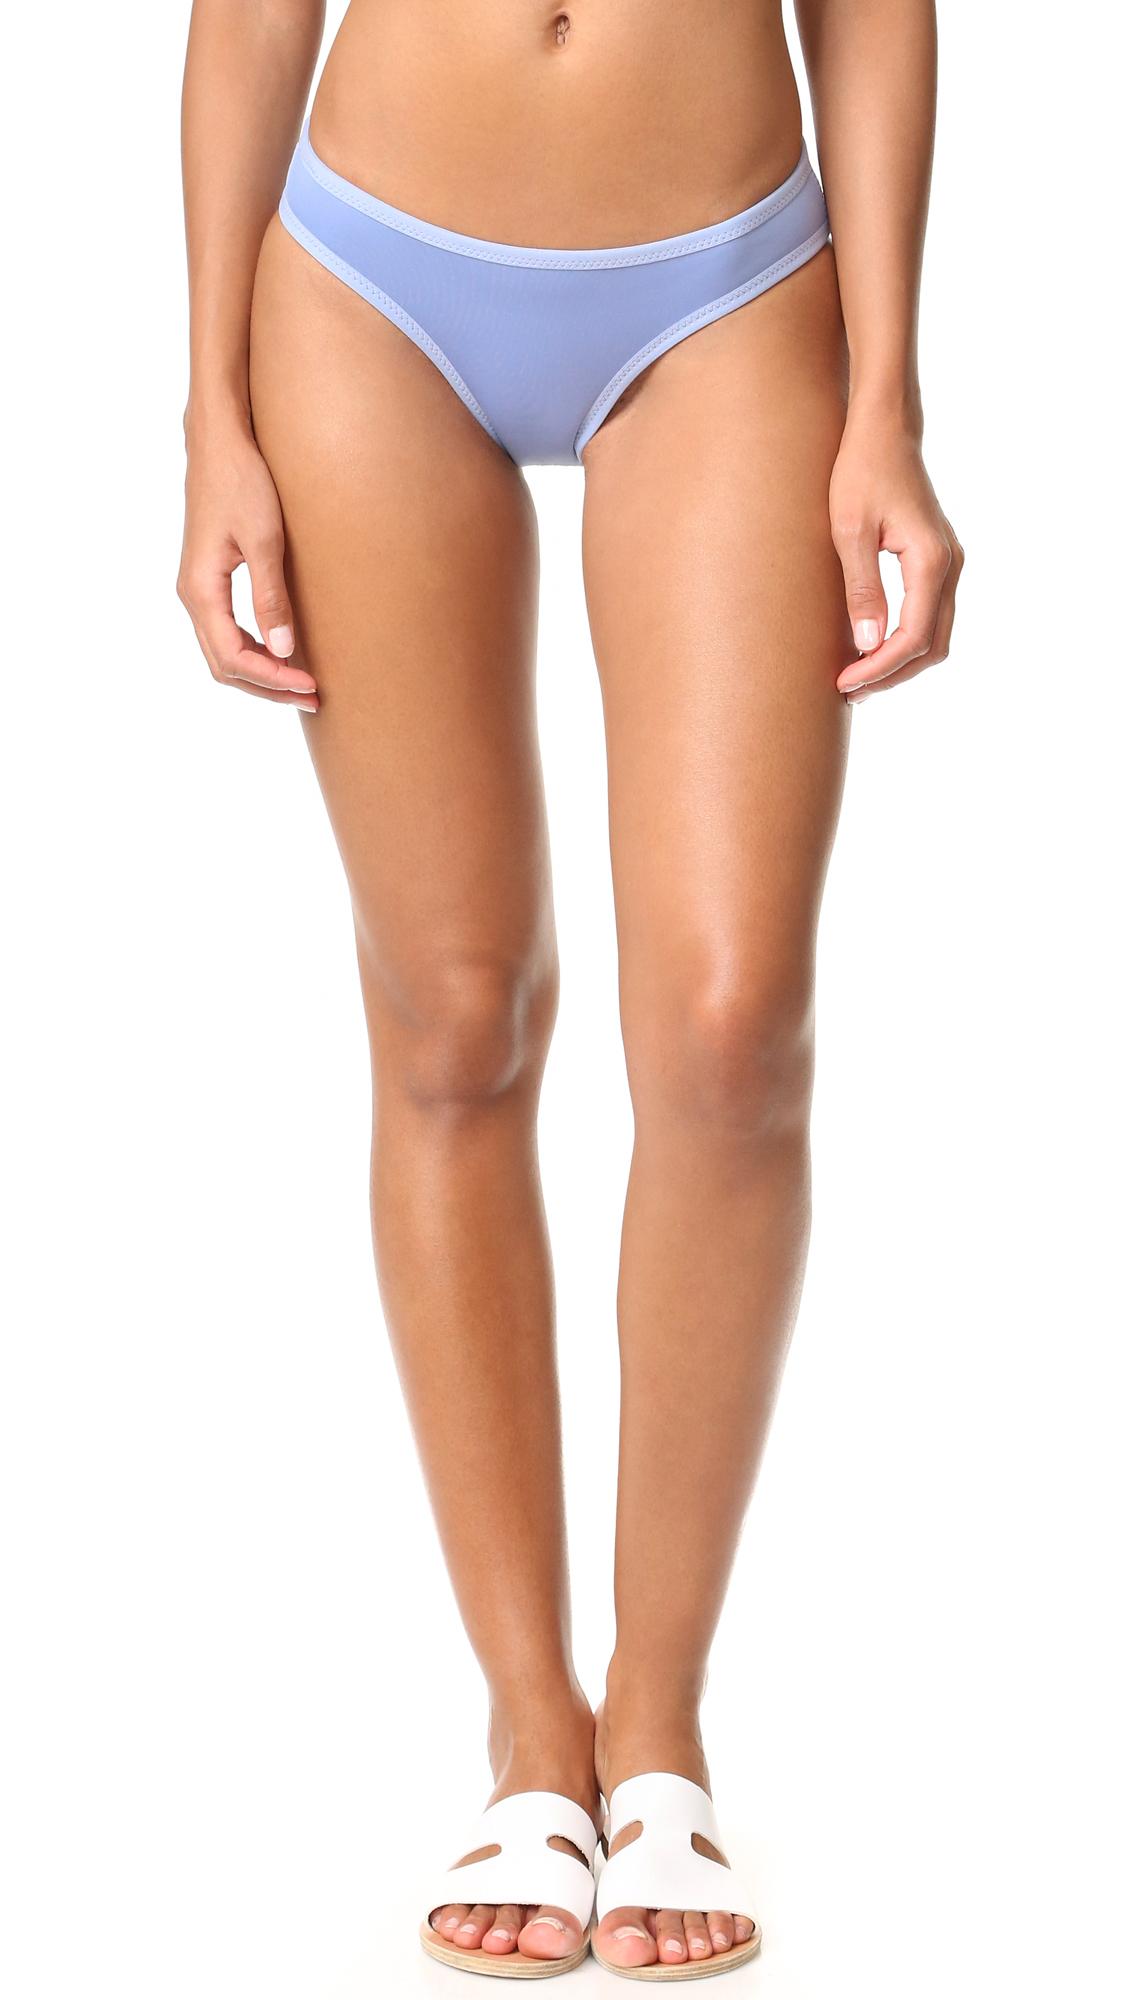 adidas by Stella McCartney Bikini Bottoms - Prism Blue